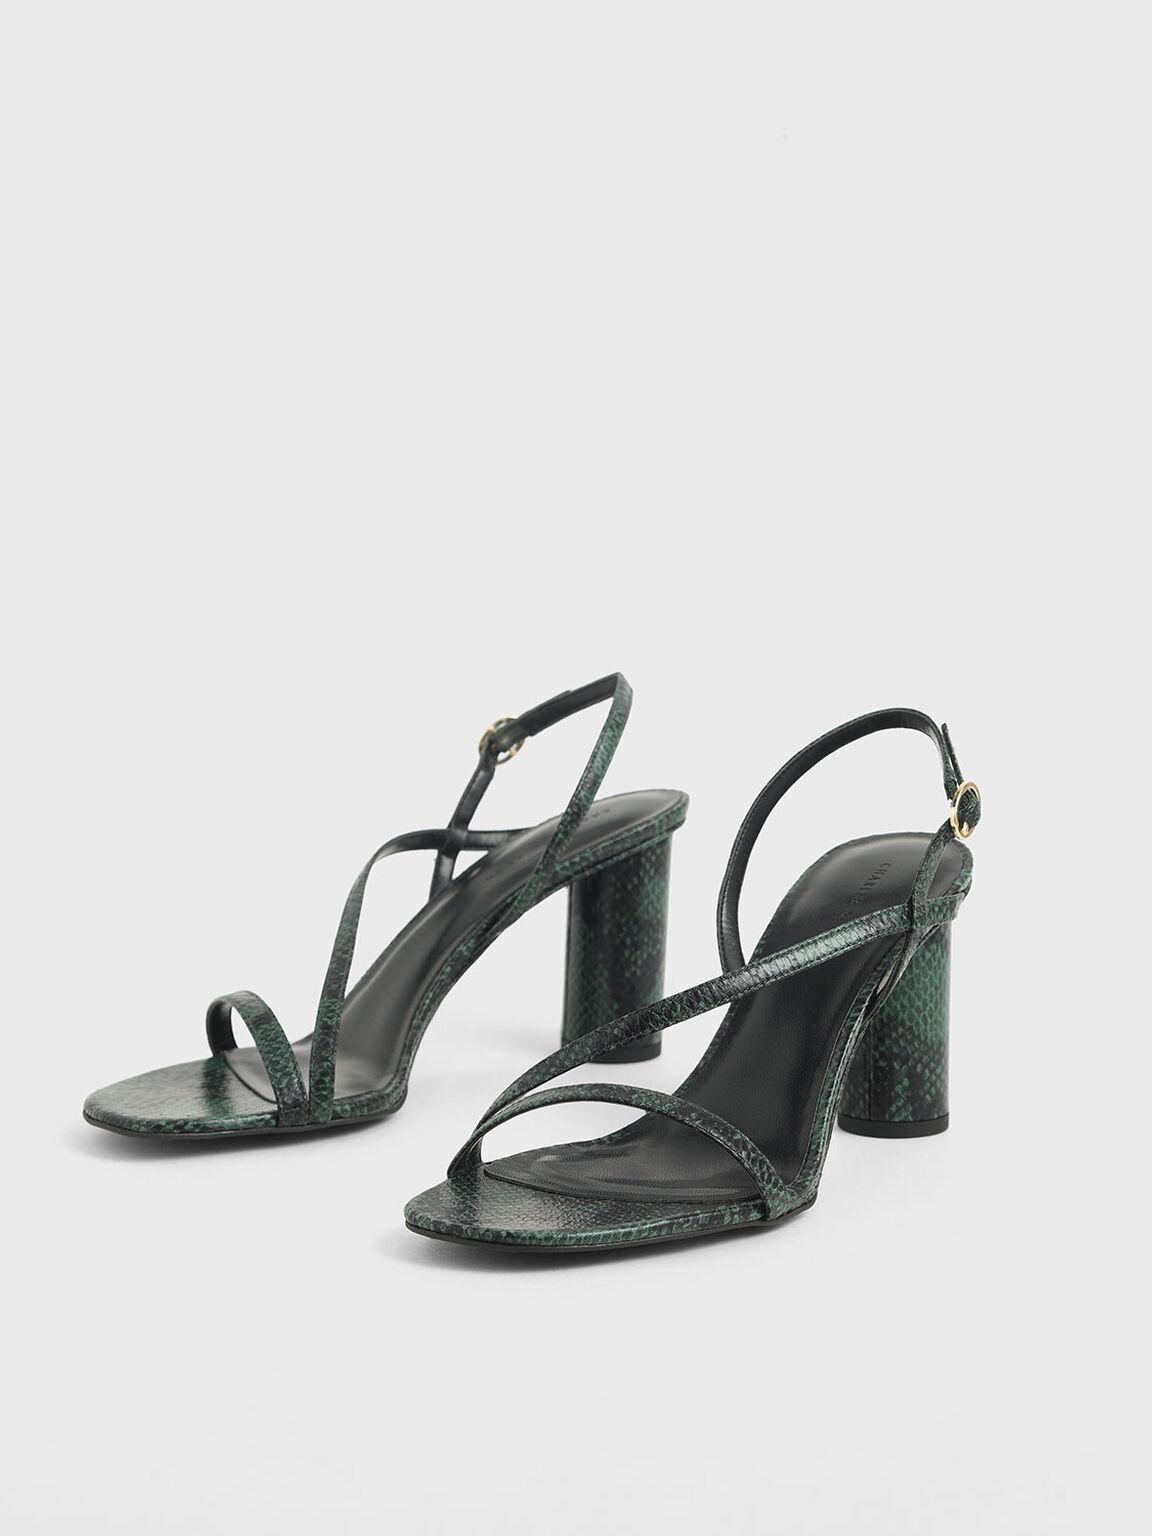 Snake Print Asymmetric Strap Sandals, Dark Green, hi-res